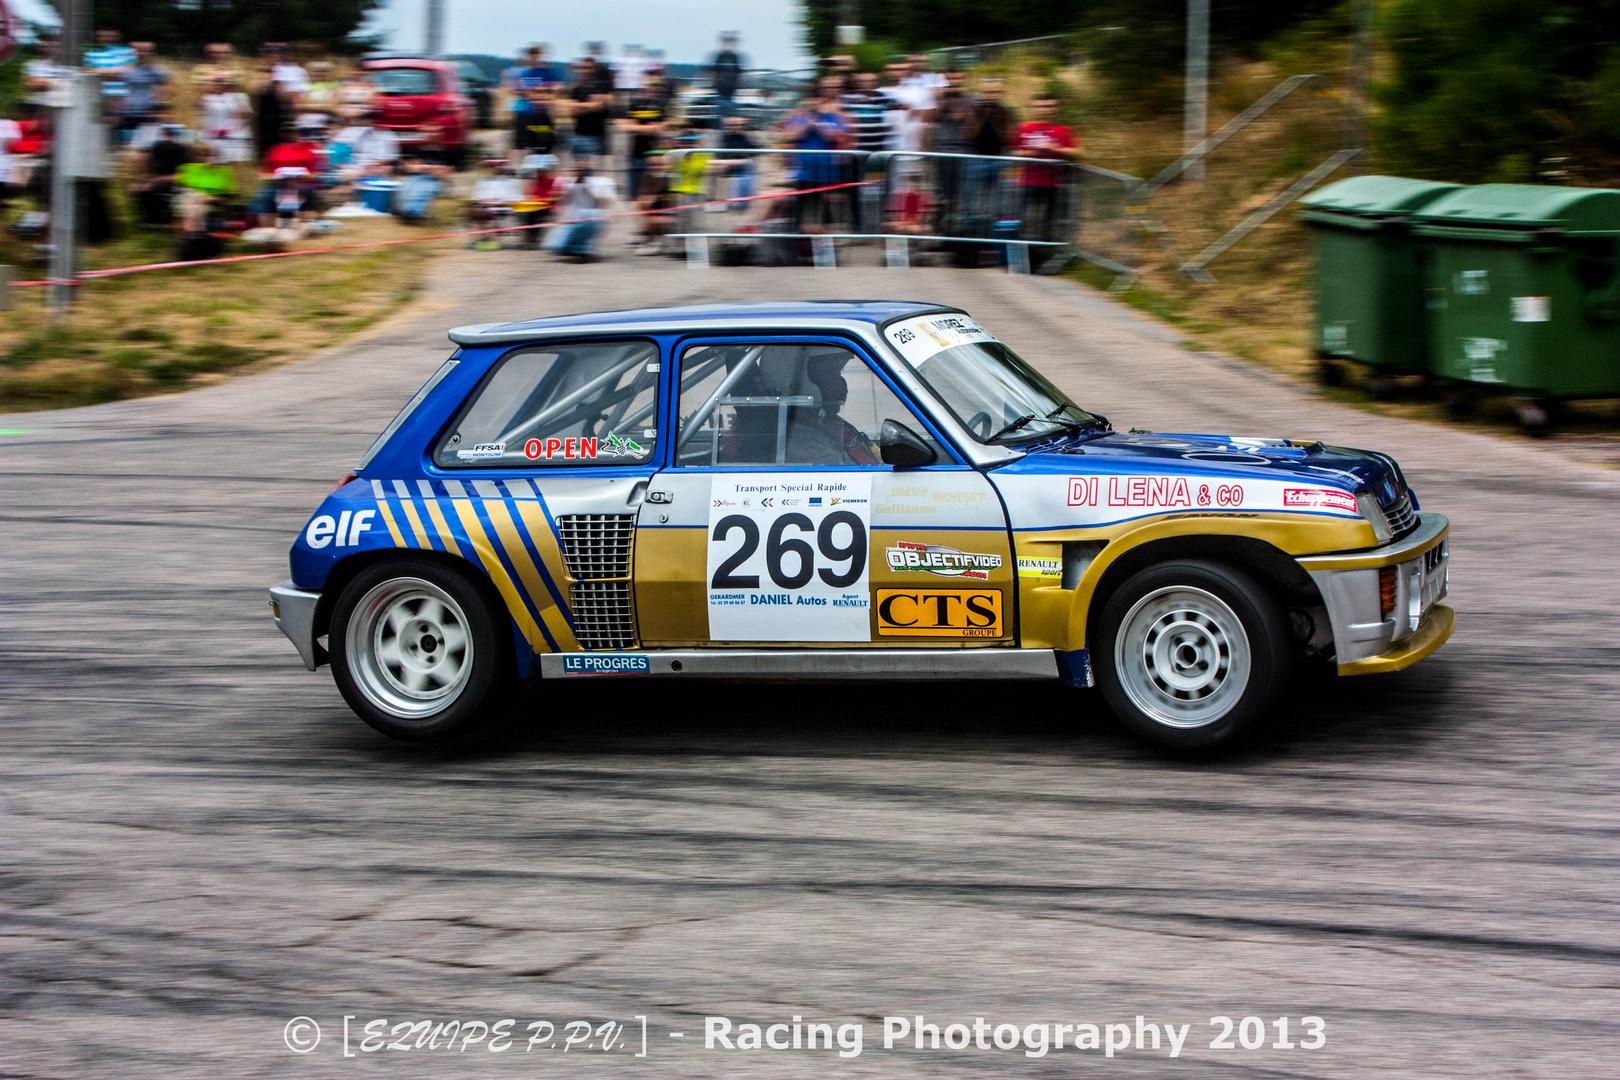 Hillclimb - France / R5 Turbo